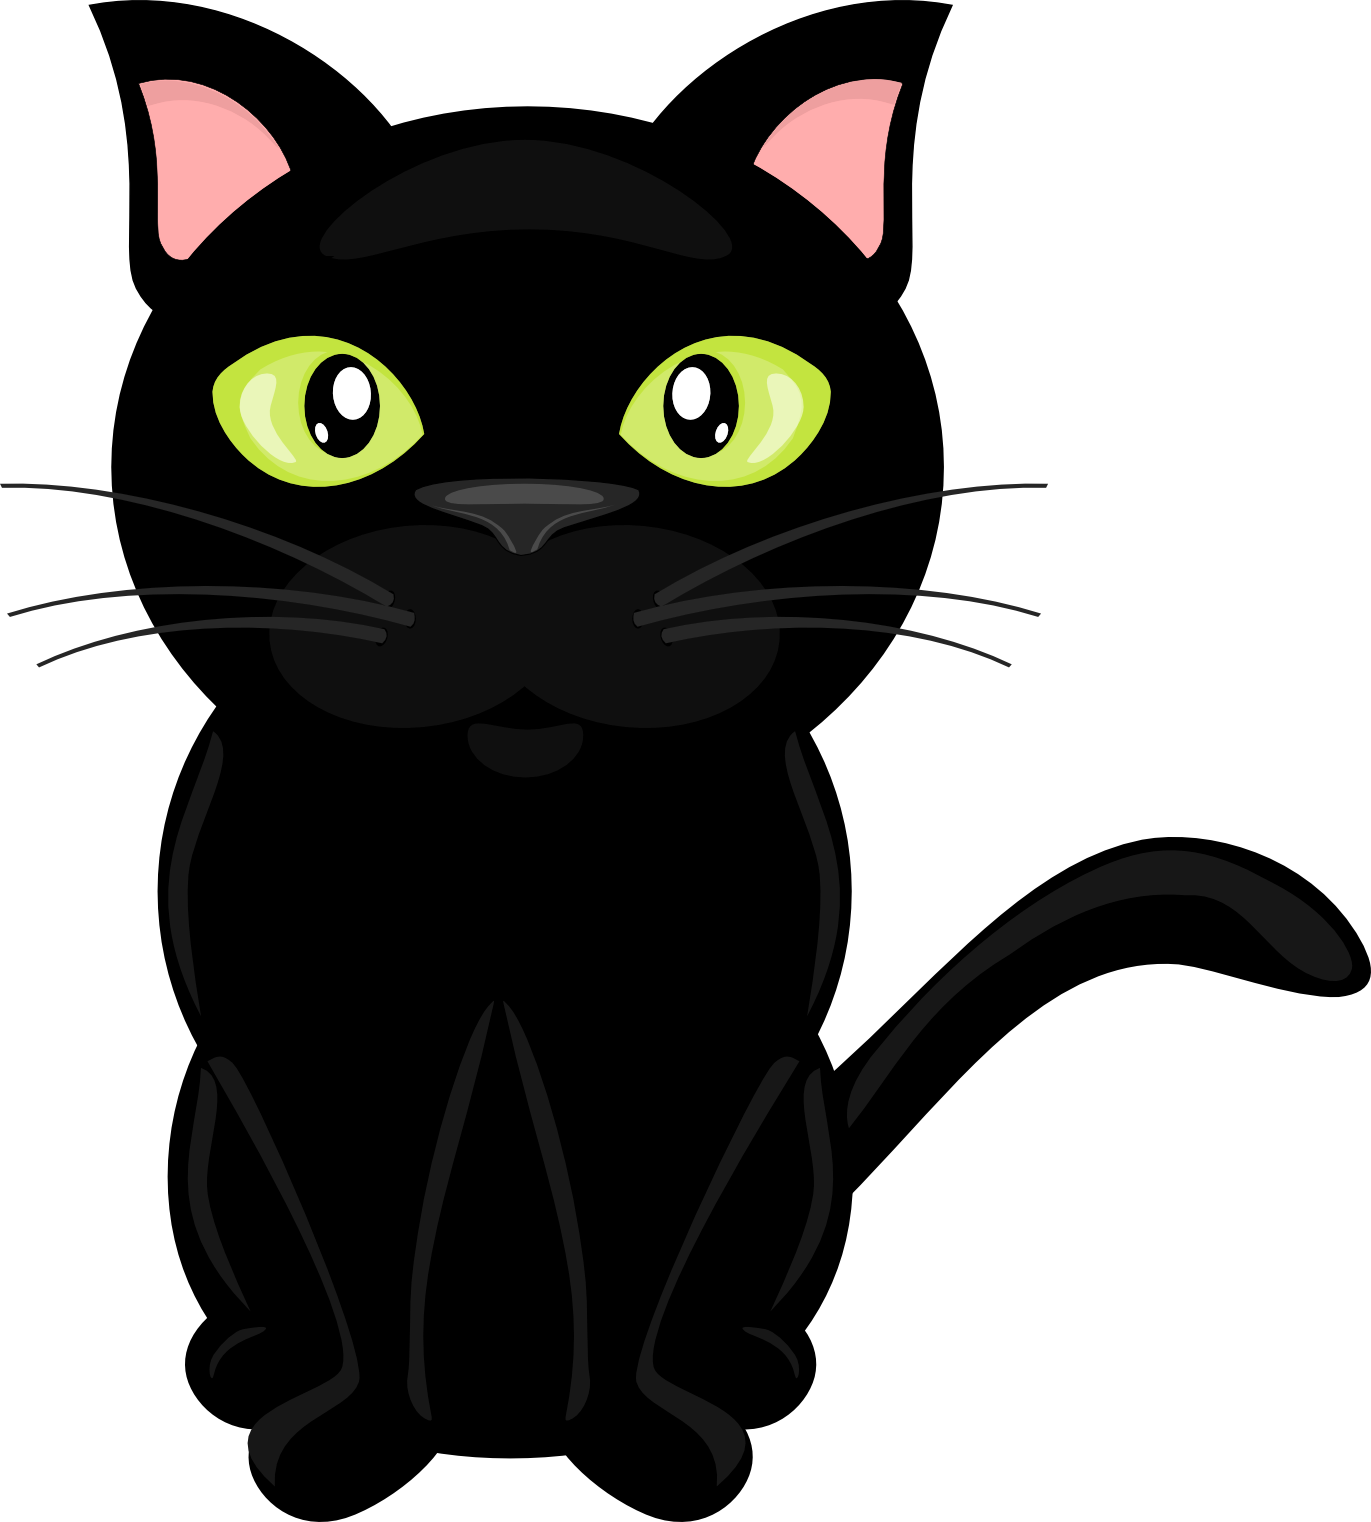 On The Farm ClipArt Cat clipart, Cat silhouette, Cute